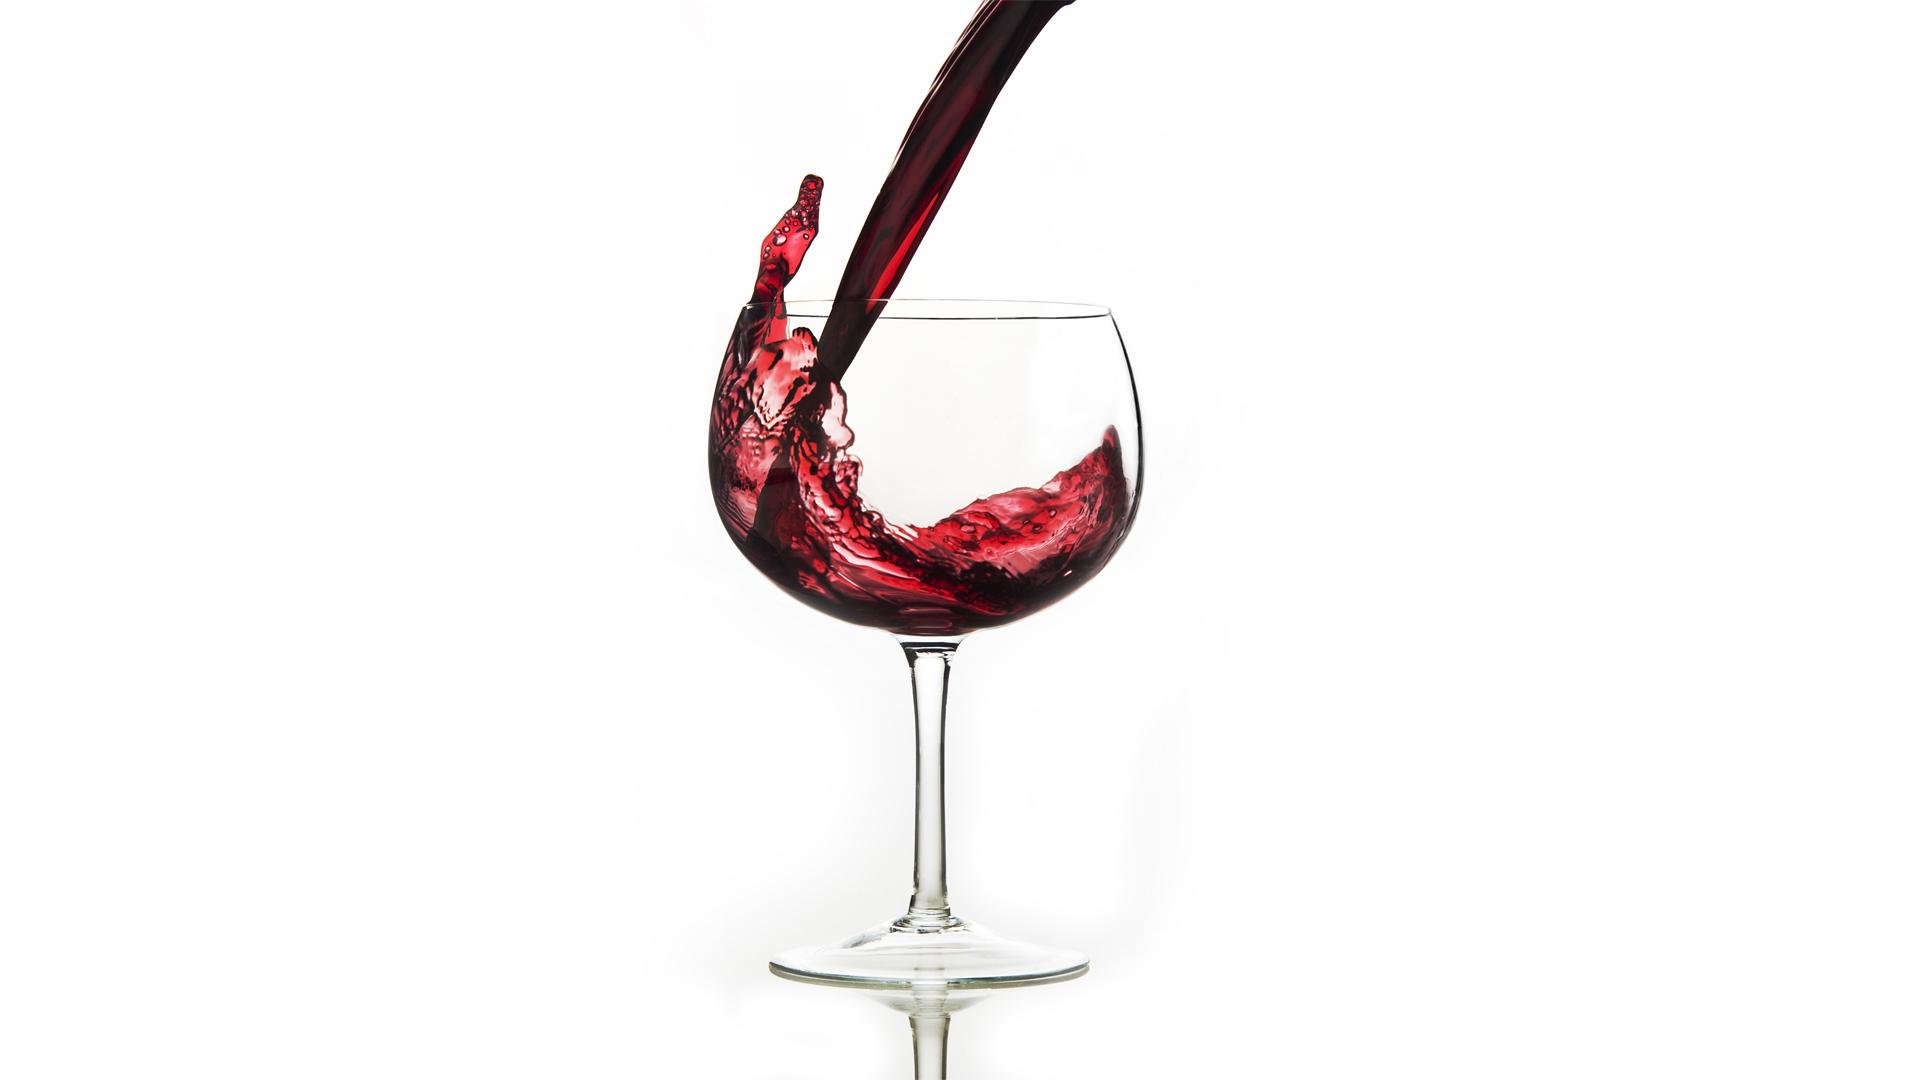 Geoff_Cardin_Portfolio_Drink_Vino_Pour.jpg